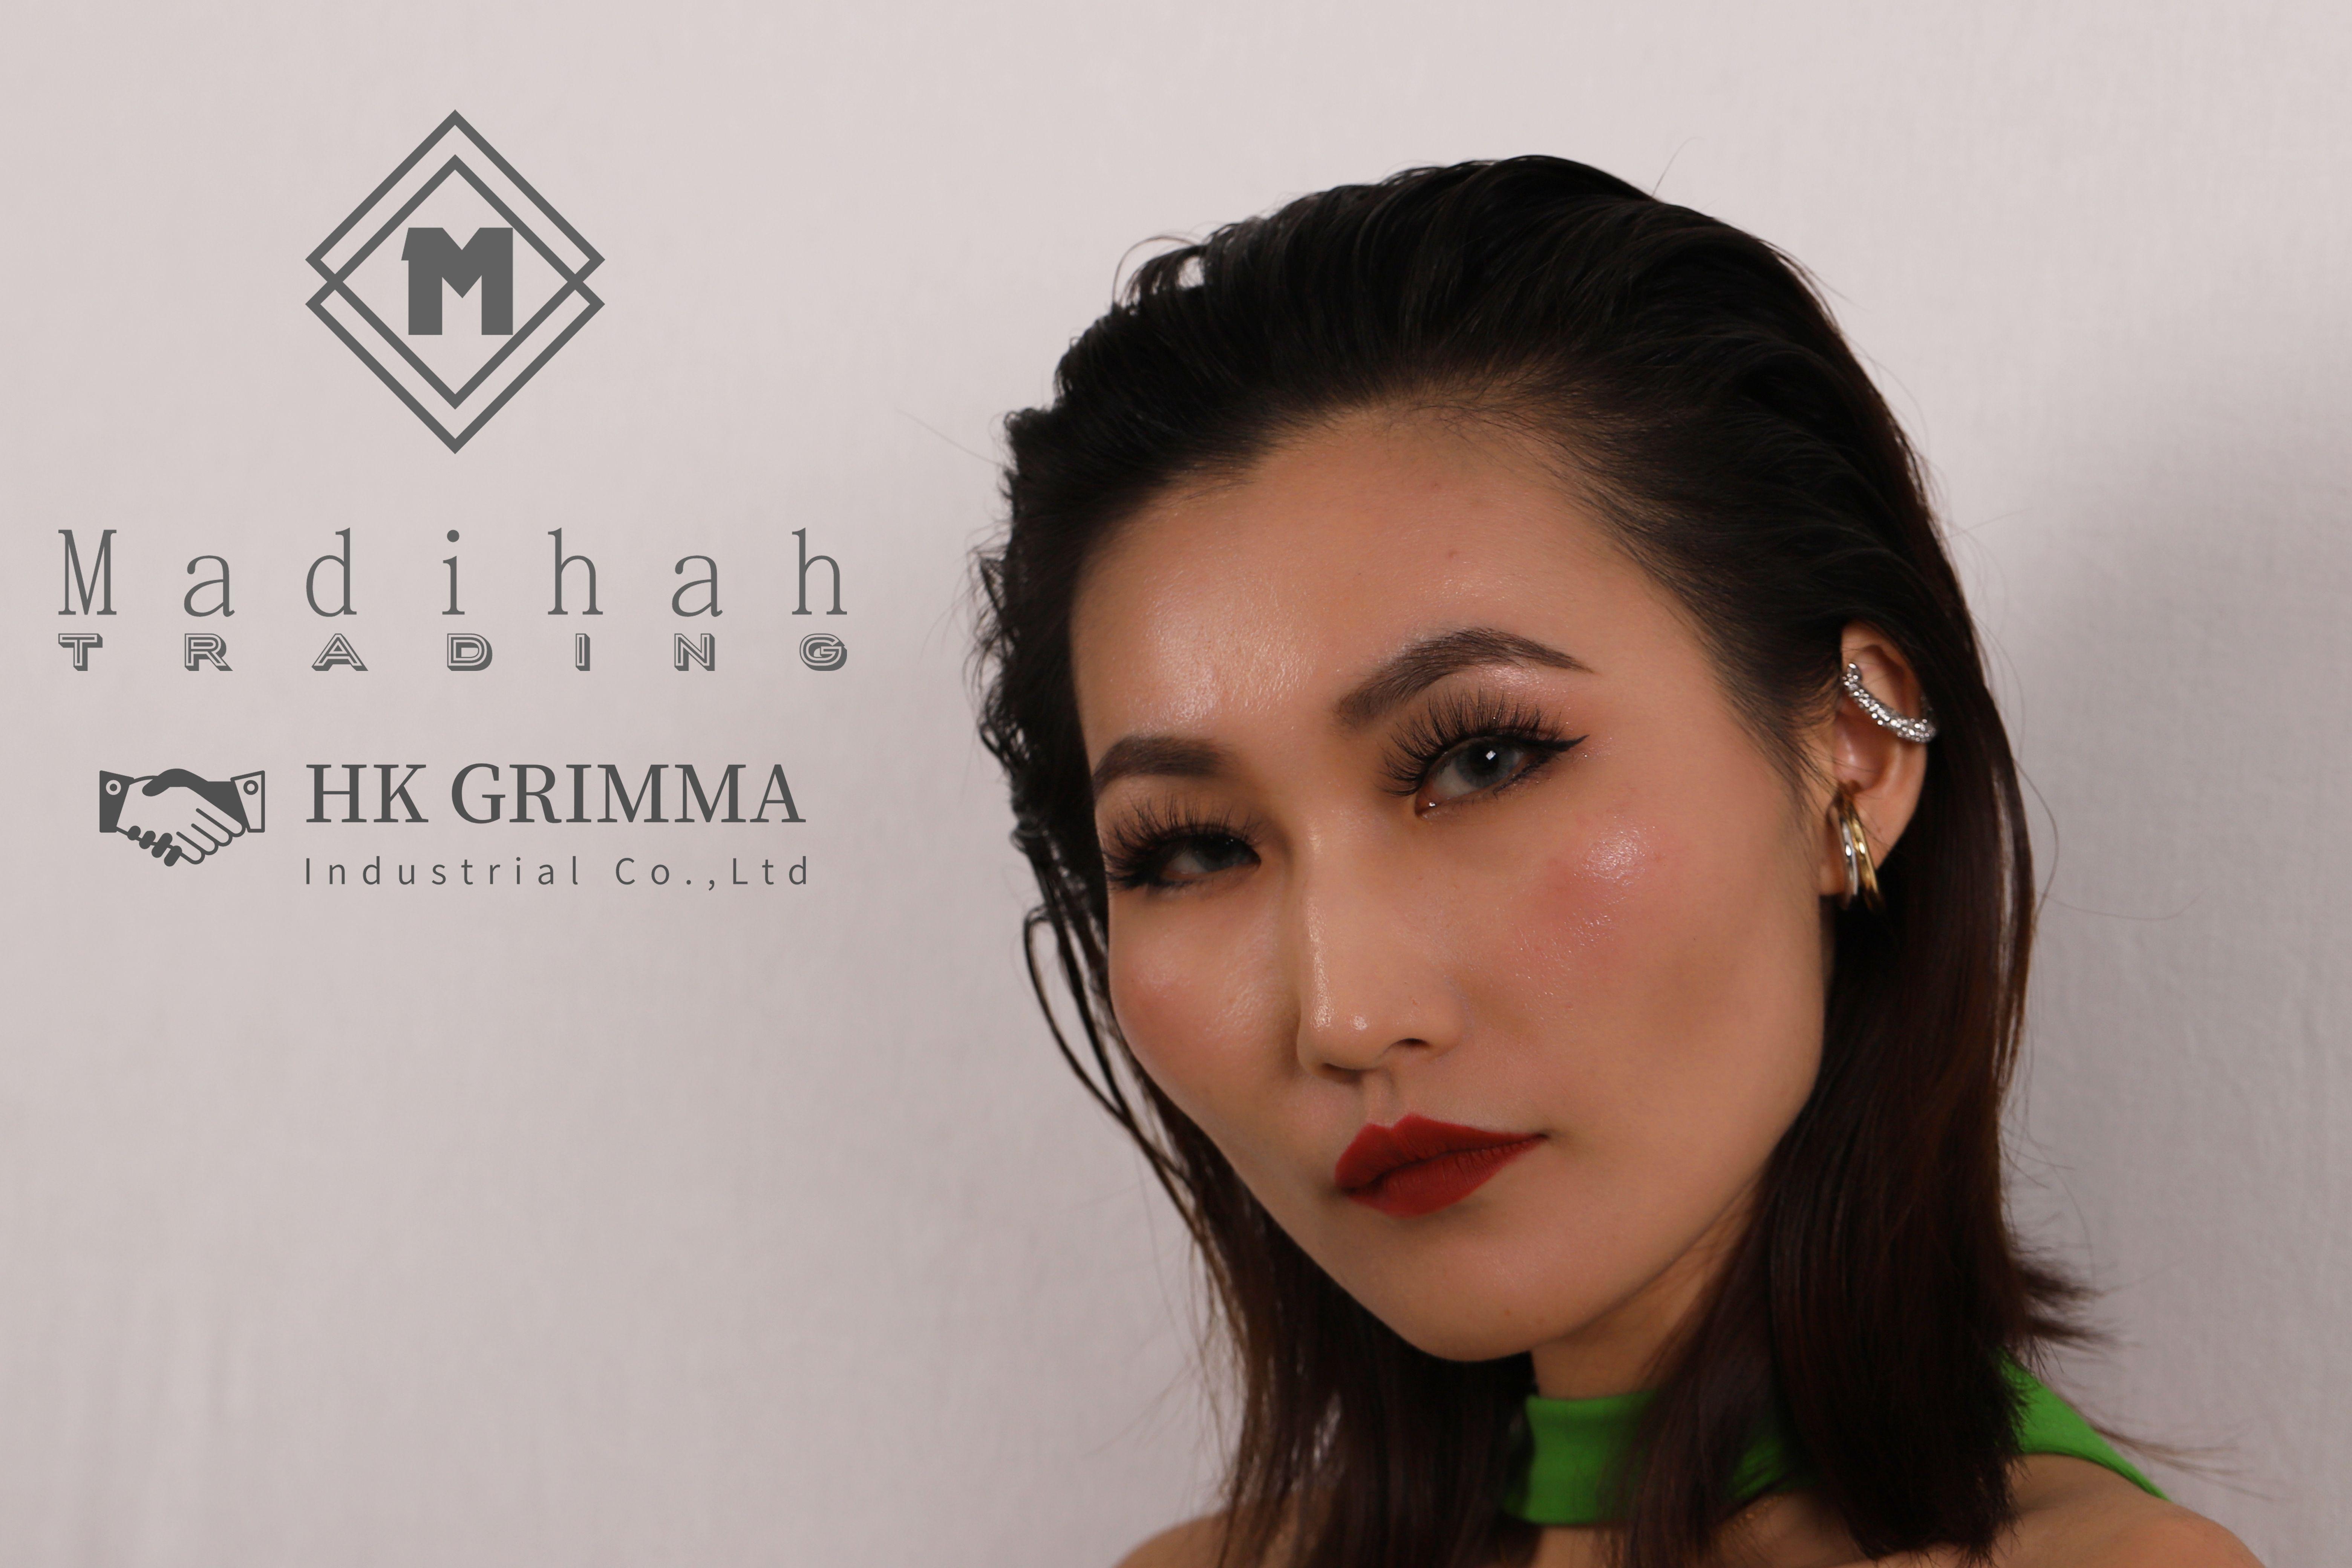 Madihah Trading 3D Mink Lashes Beauty Supply Vendor